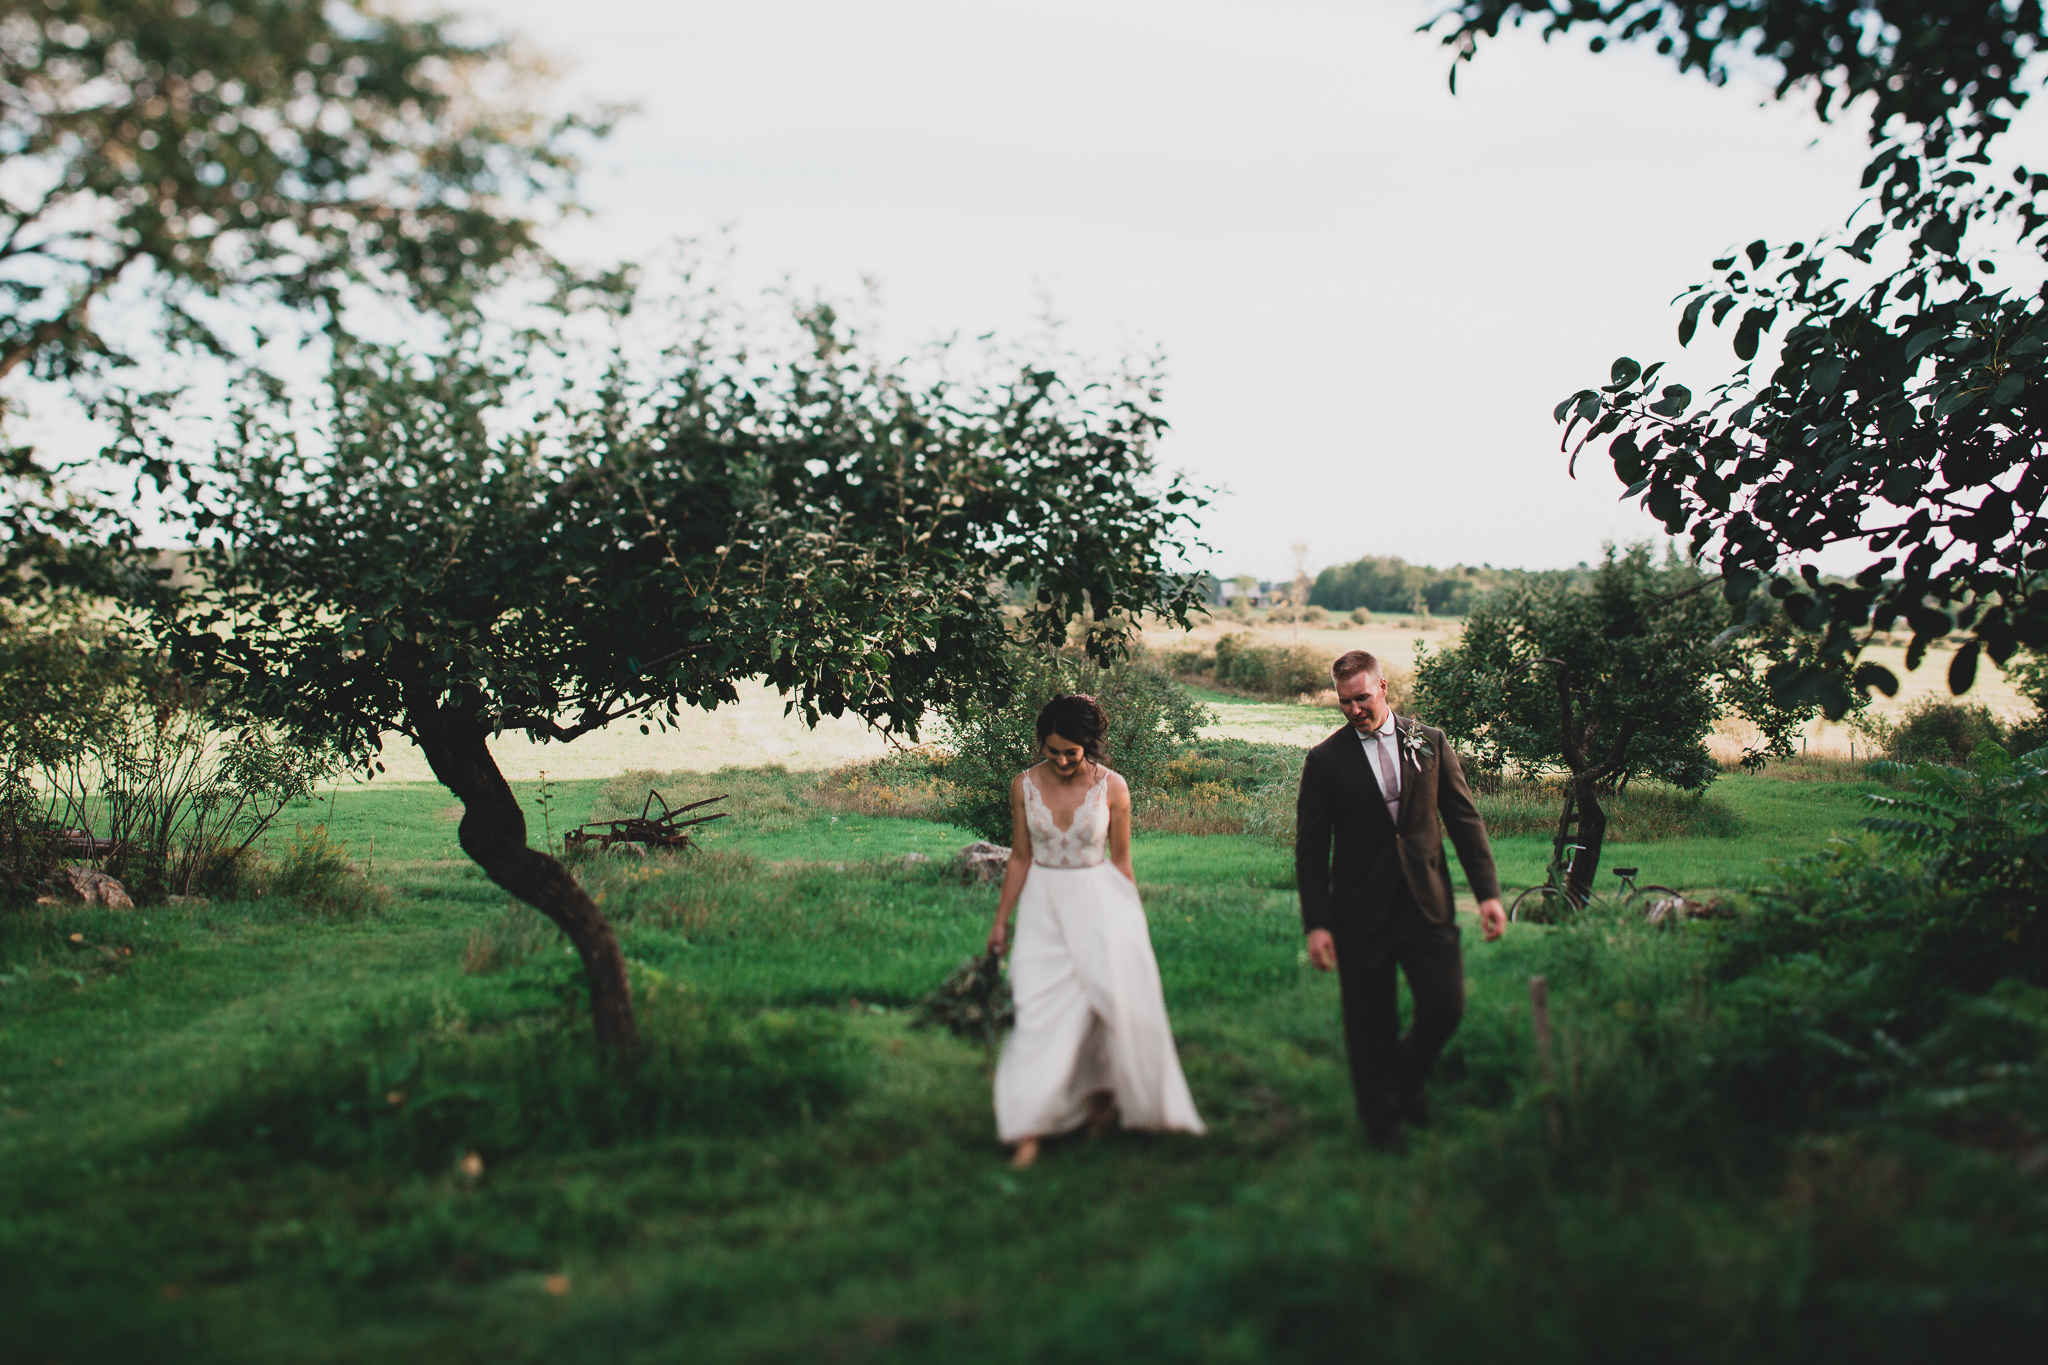 Bride and groom walking candidly Jonathan Kuhn